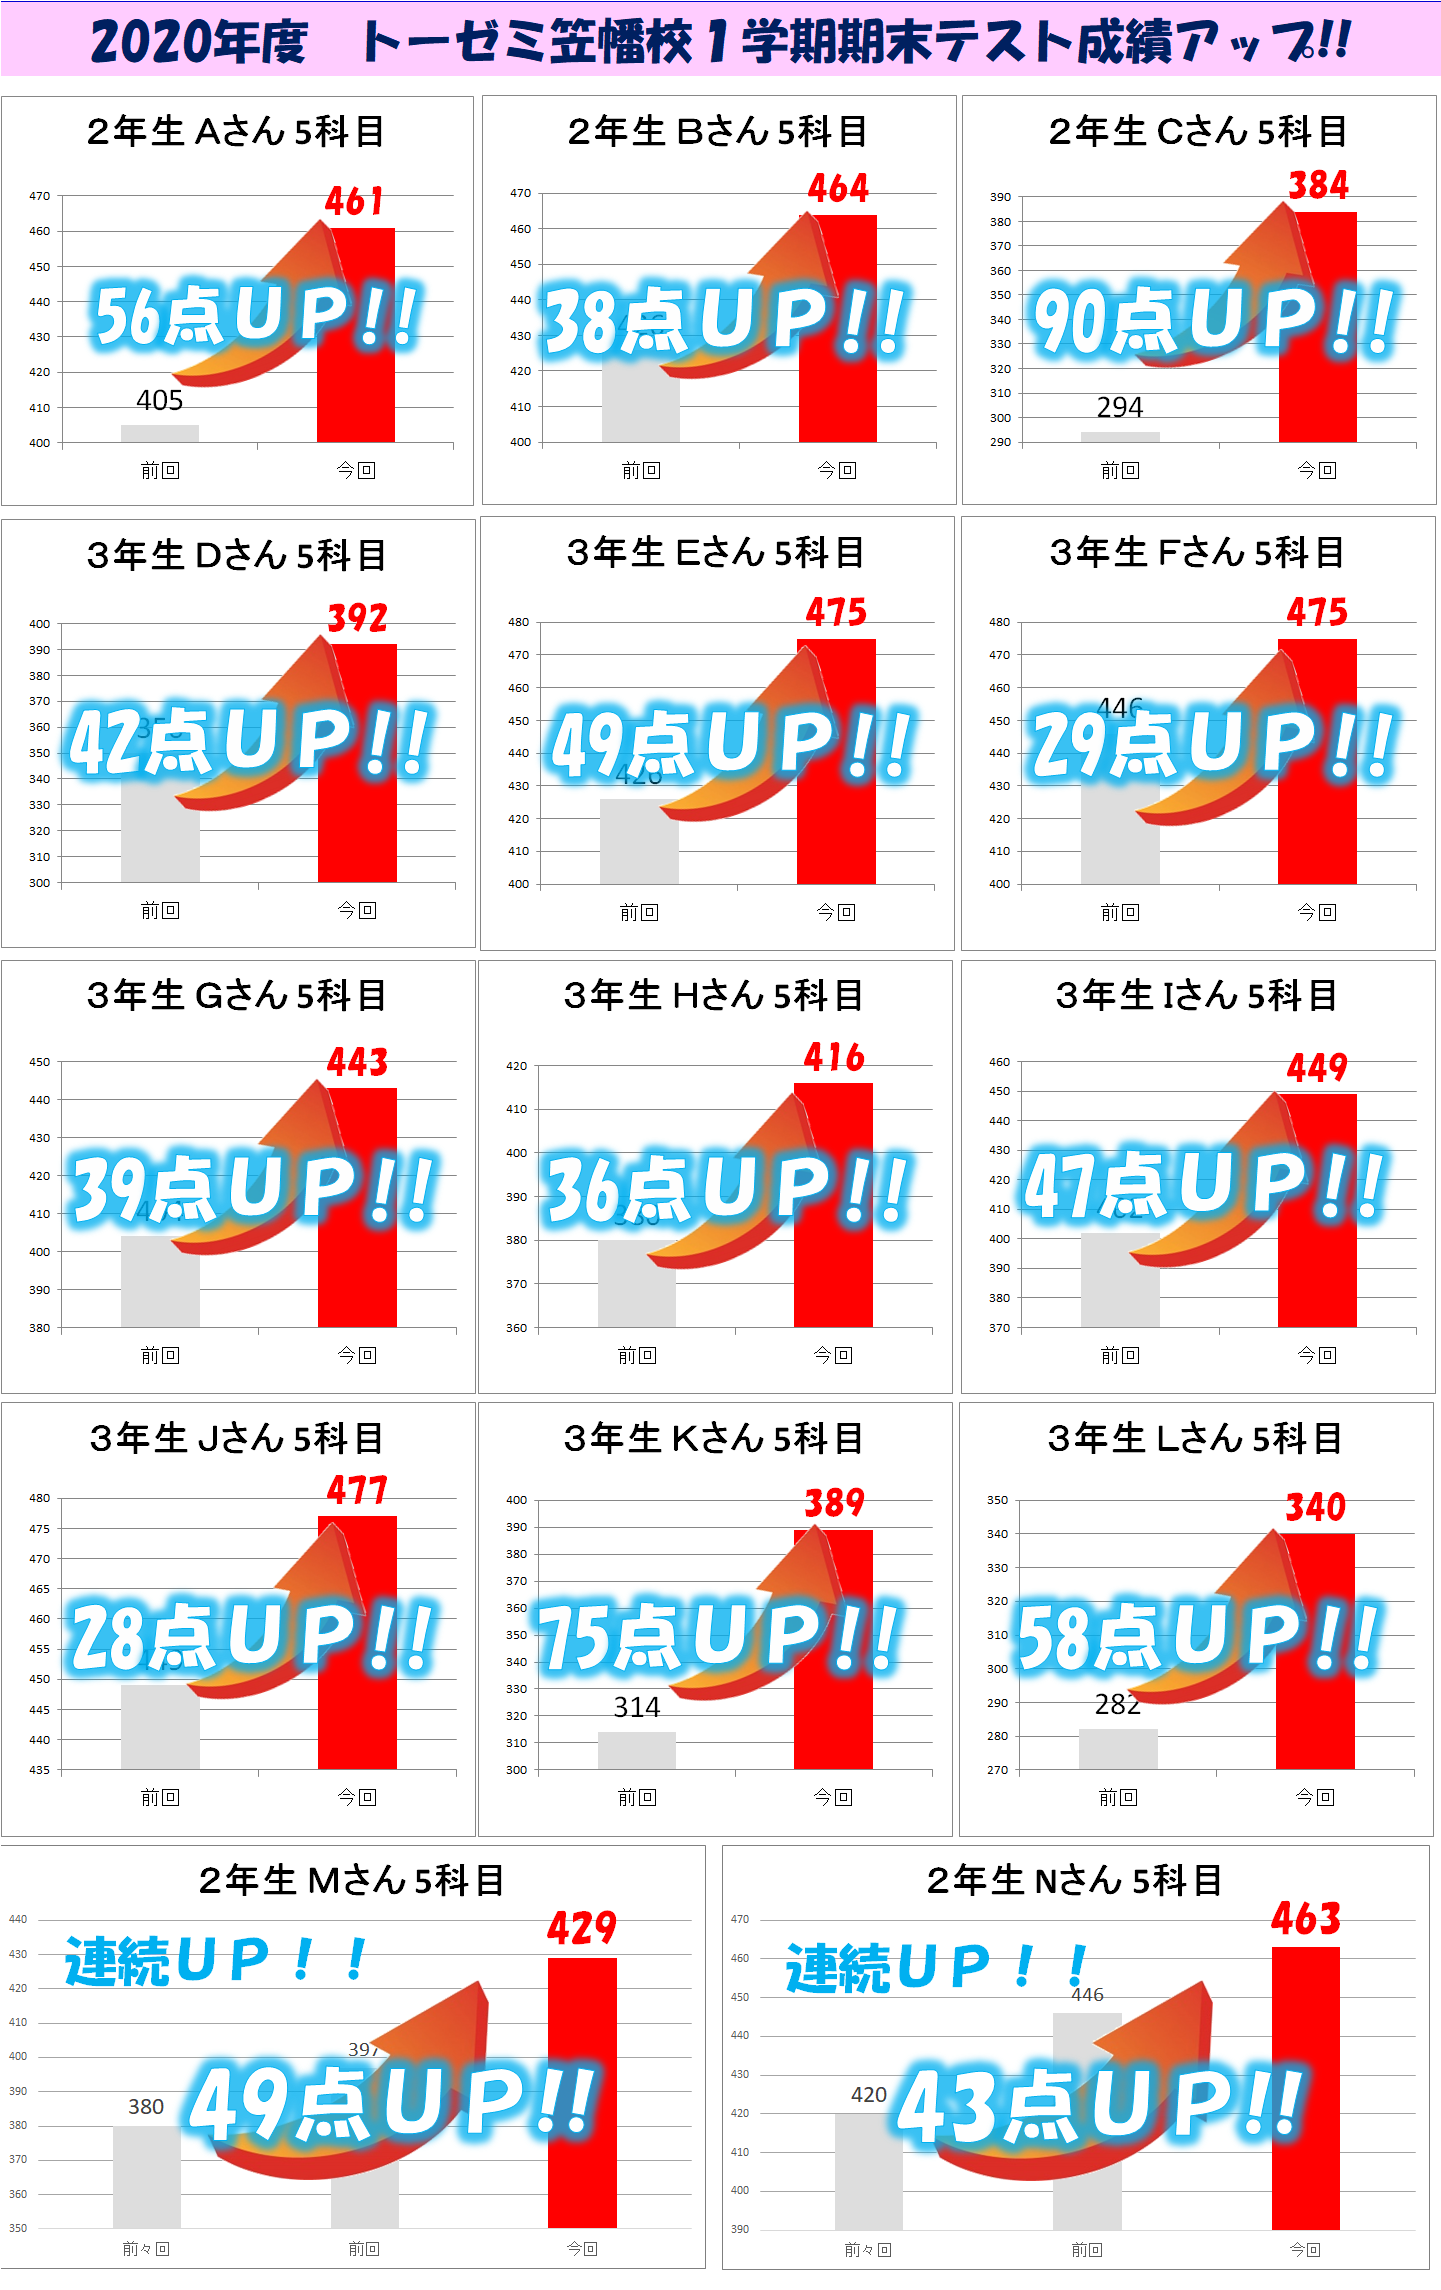 2020%e4%b8%80%e5%ad%a6%e6%9c%9f%e6%9c%9f%e6%9c%ab5%e7%a7%91%e7%9b%ae